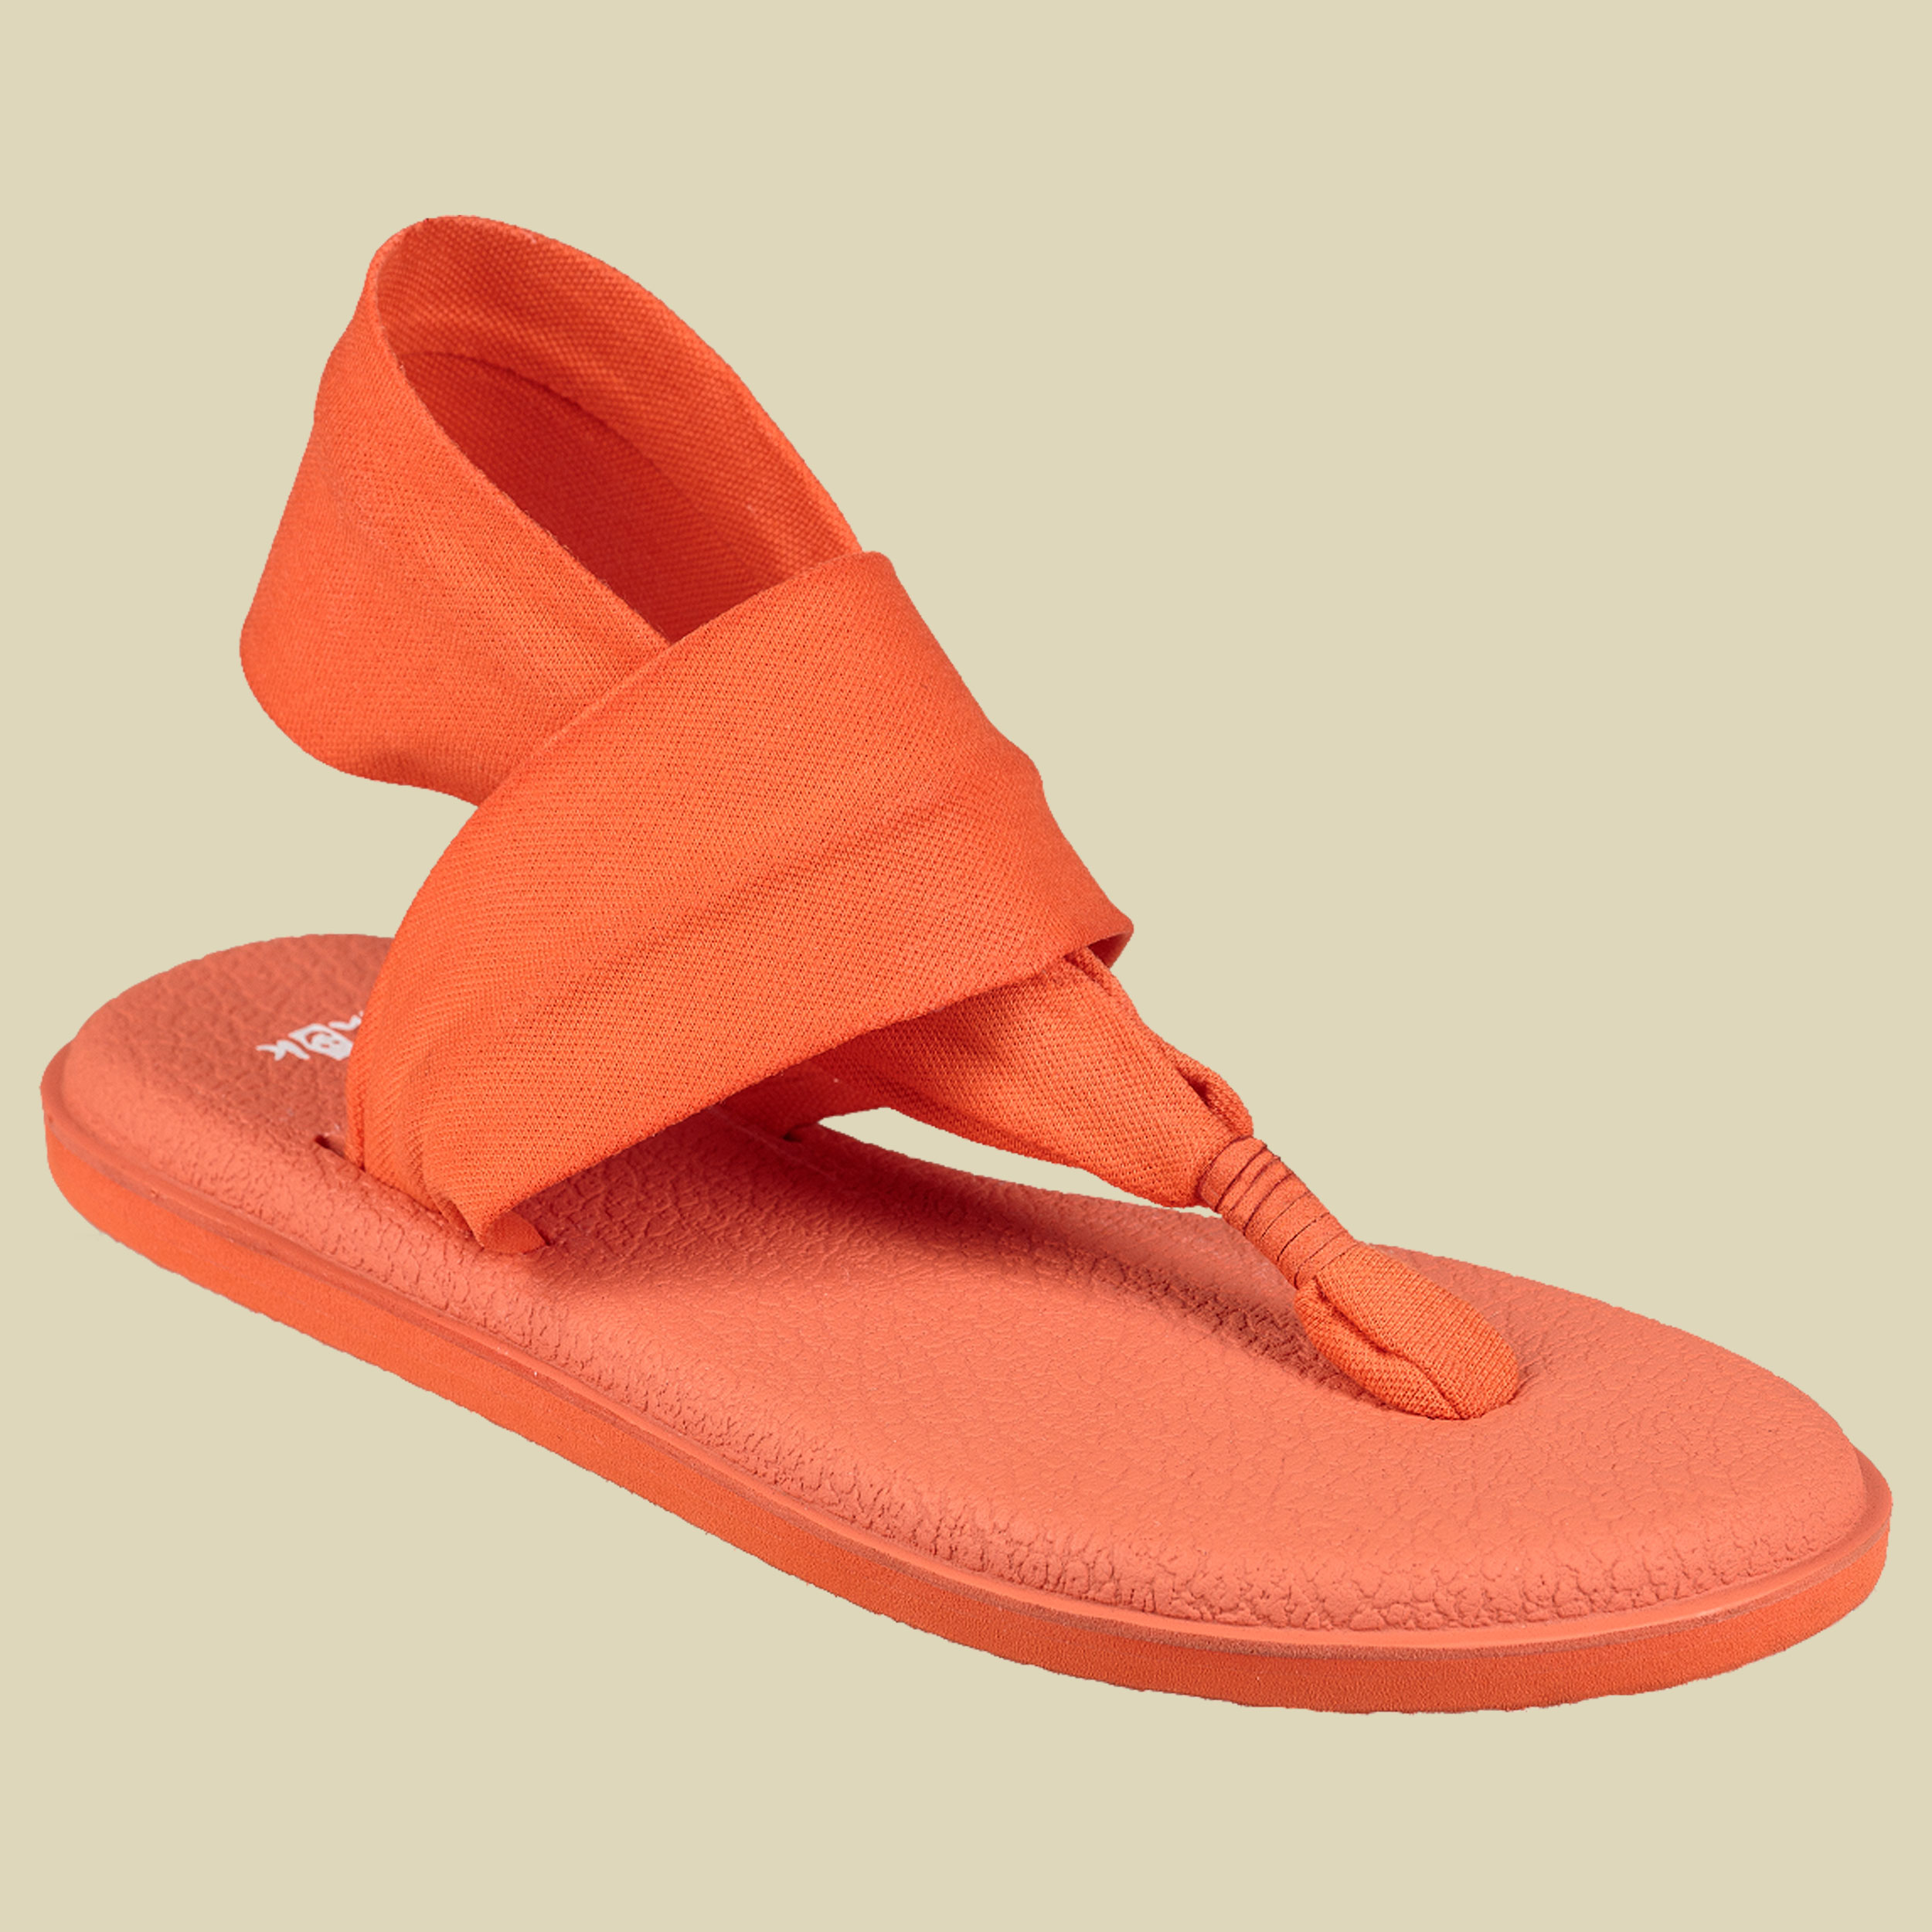 Sanuk Yoga Sling 2 Spectrum Women Damen Zehentrenner-Sandalen Größe UK 4 nasturtium